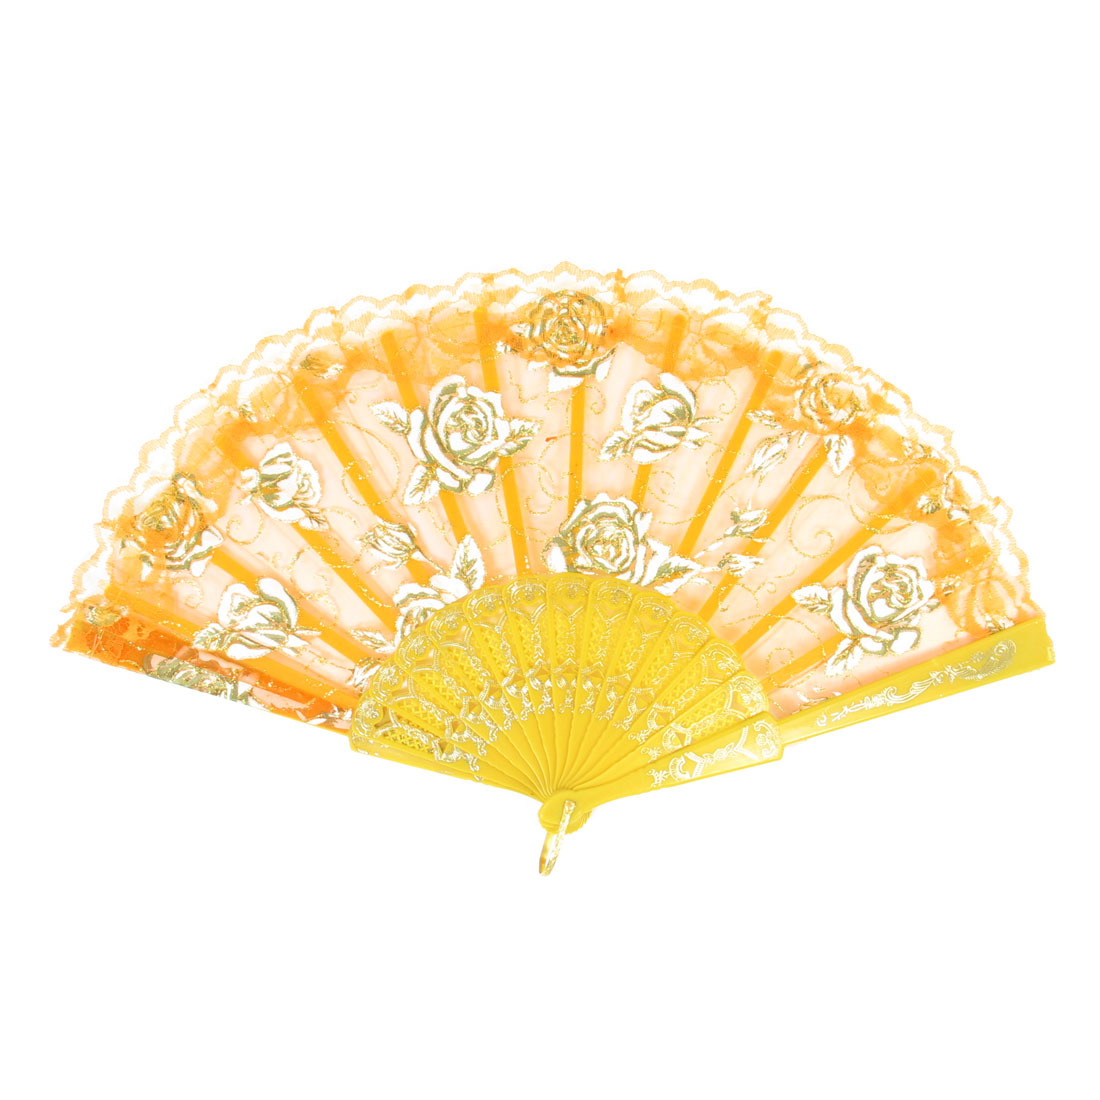 U Ring Rose Pattern Lace Trim Plastic Frame Orange Yellow White Folding Hand Fan